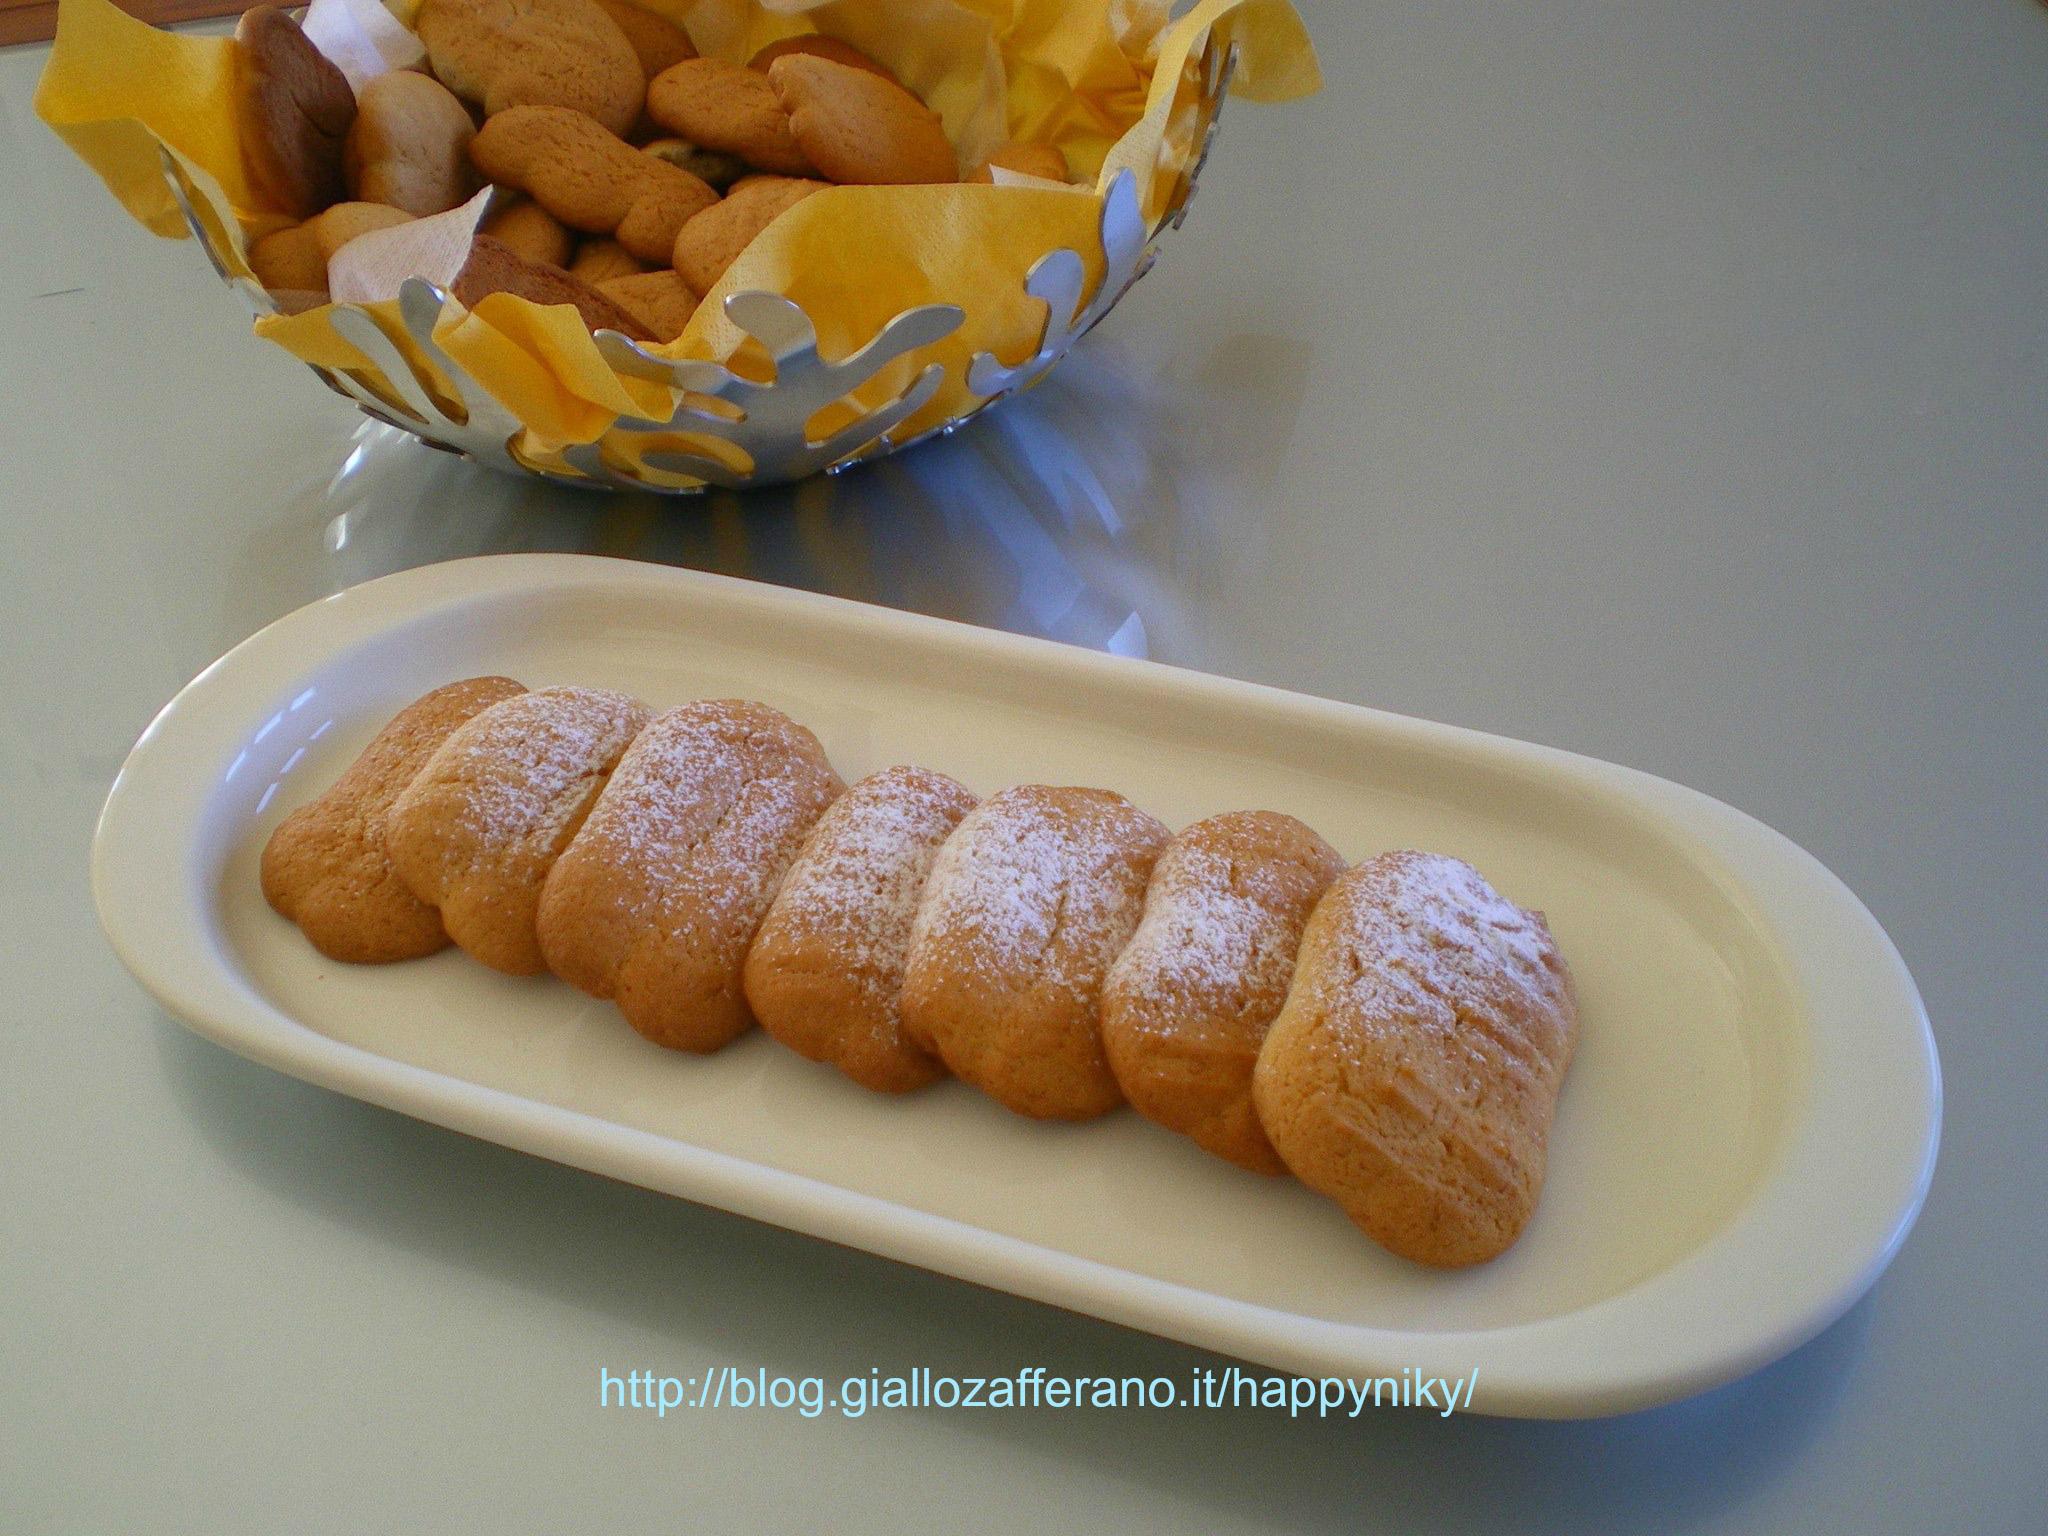 Biscotti da latte alla panna (bimby)